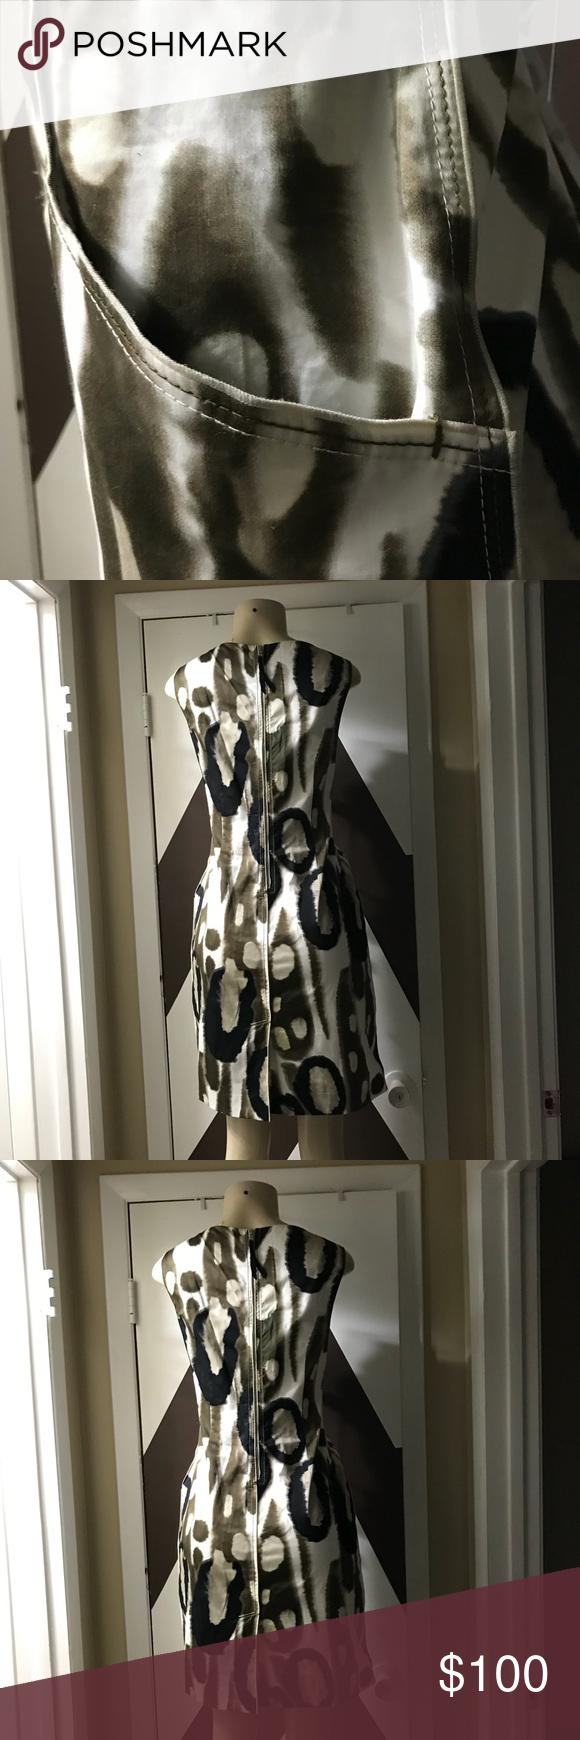 Tahari Asl Shawl Collar Ruched Waist Satin Cocktail Dress Dillard S Cocktail Dresses With Jackets Cocktail Dress Classy Satin Cocktail Dress [ 2040 x 1760 Pixel ]